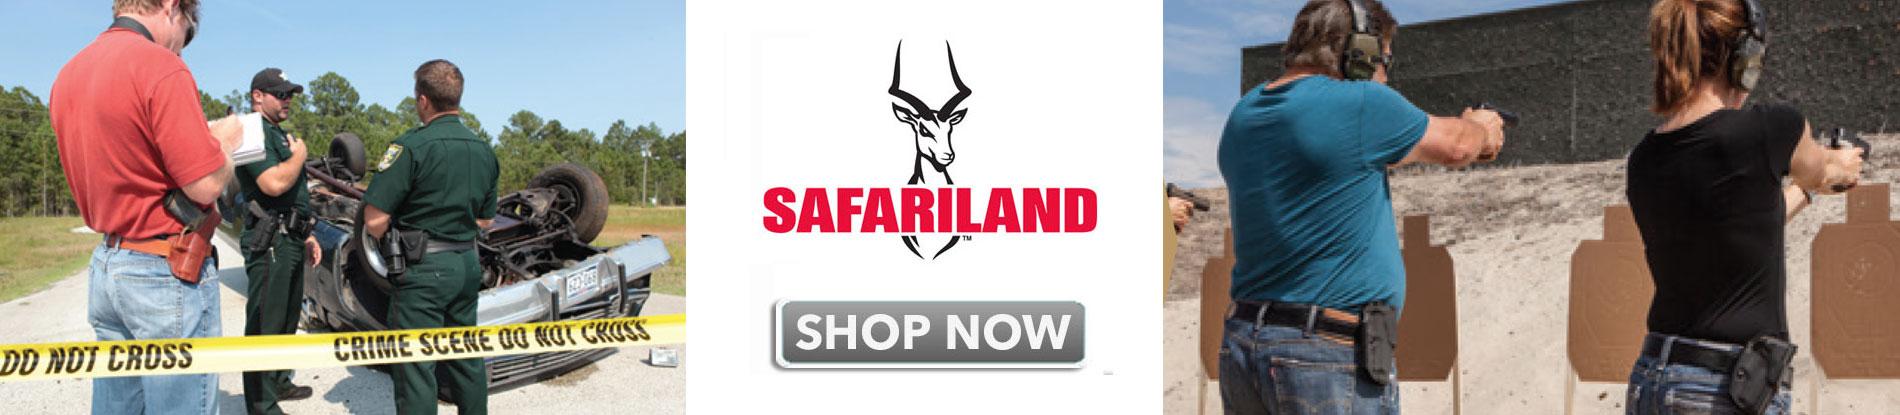 carousel_safariland_new191039193502.jpg